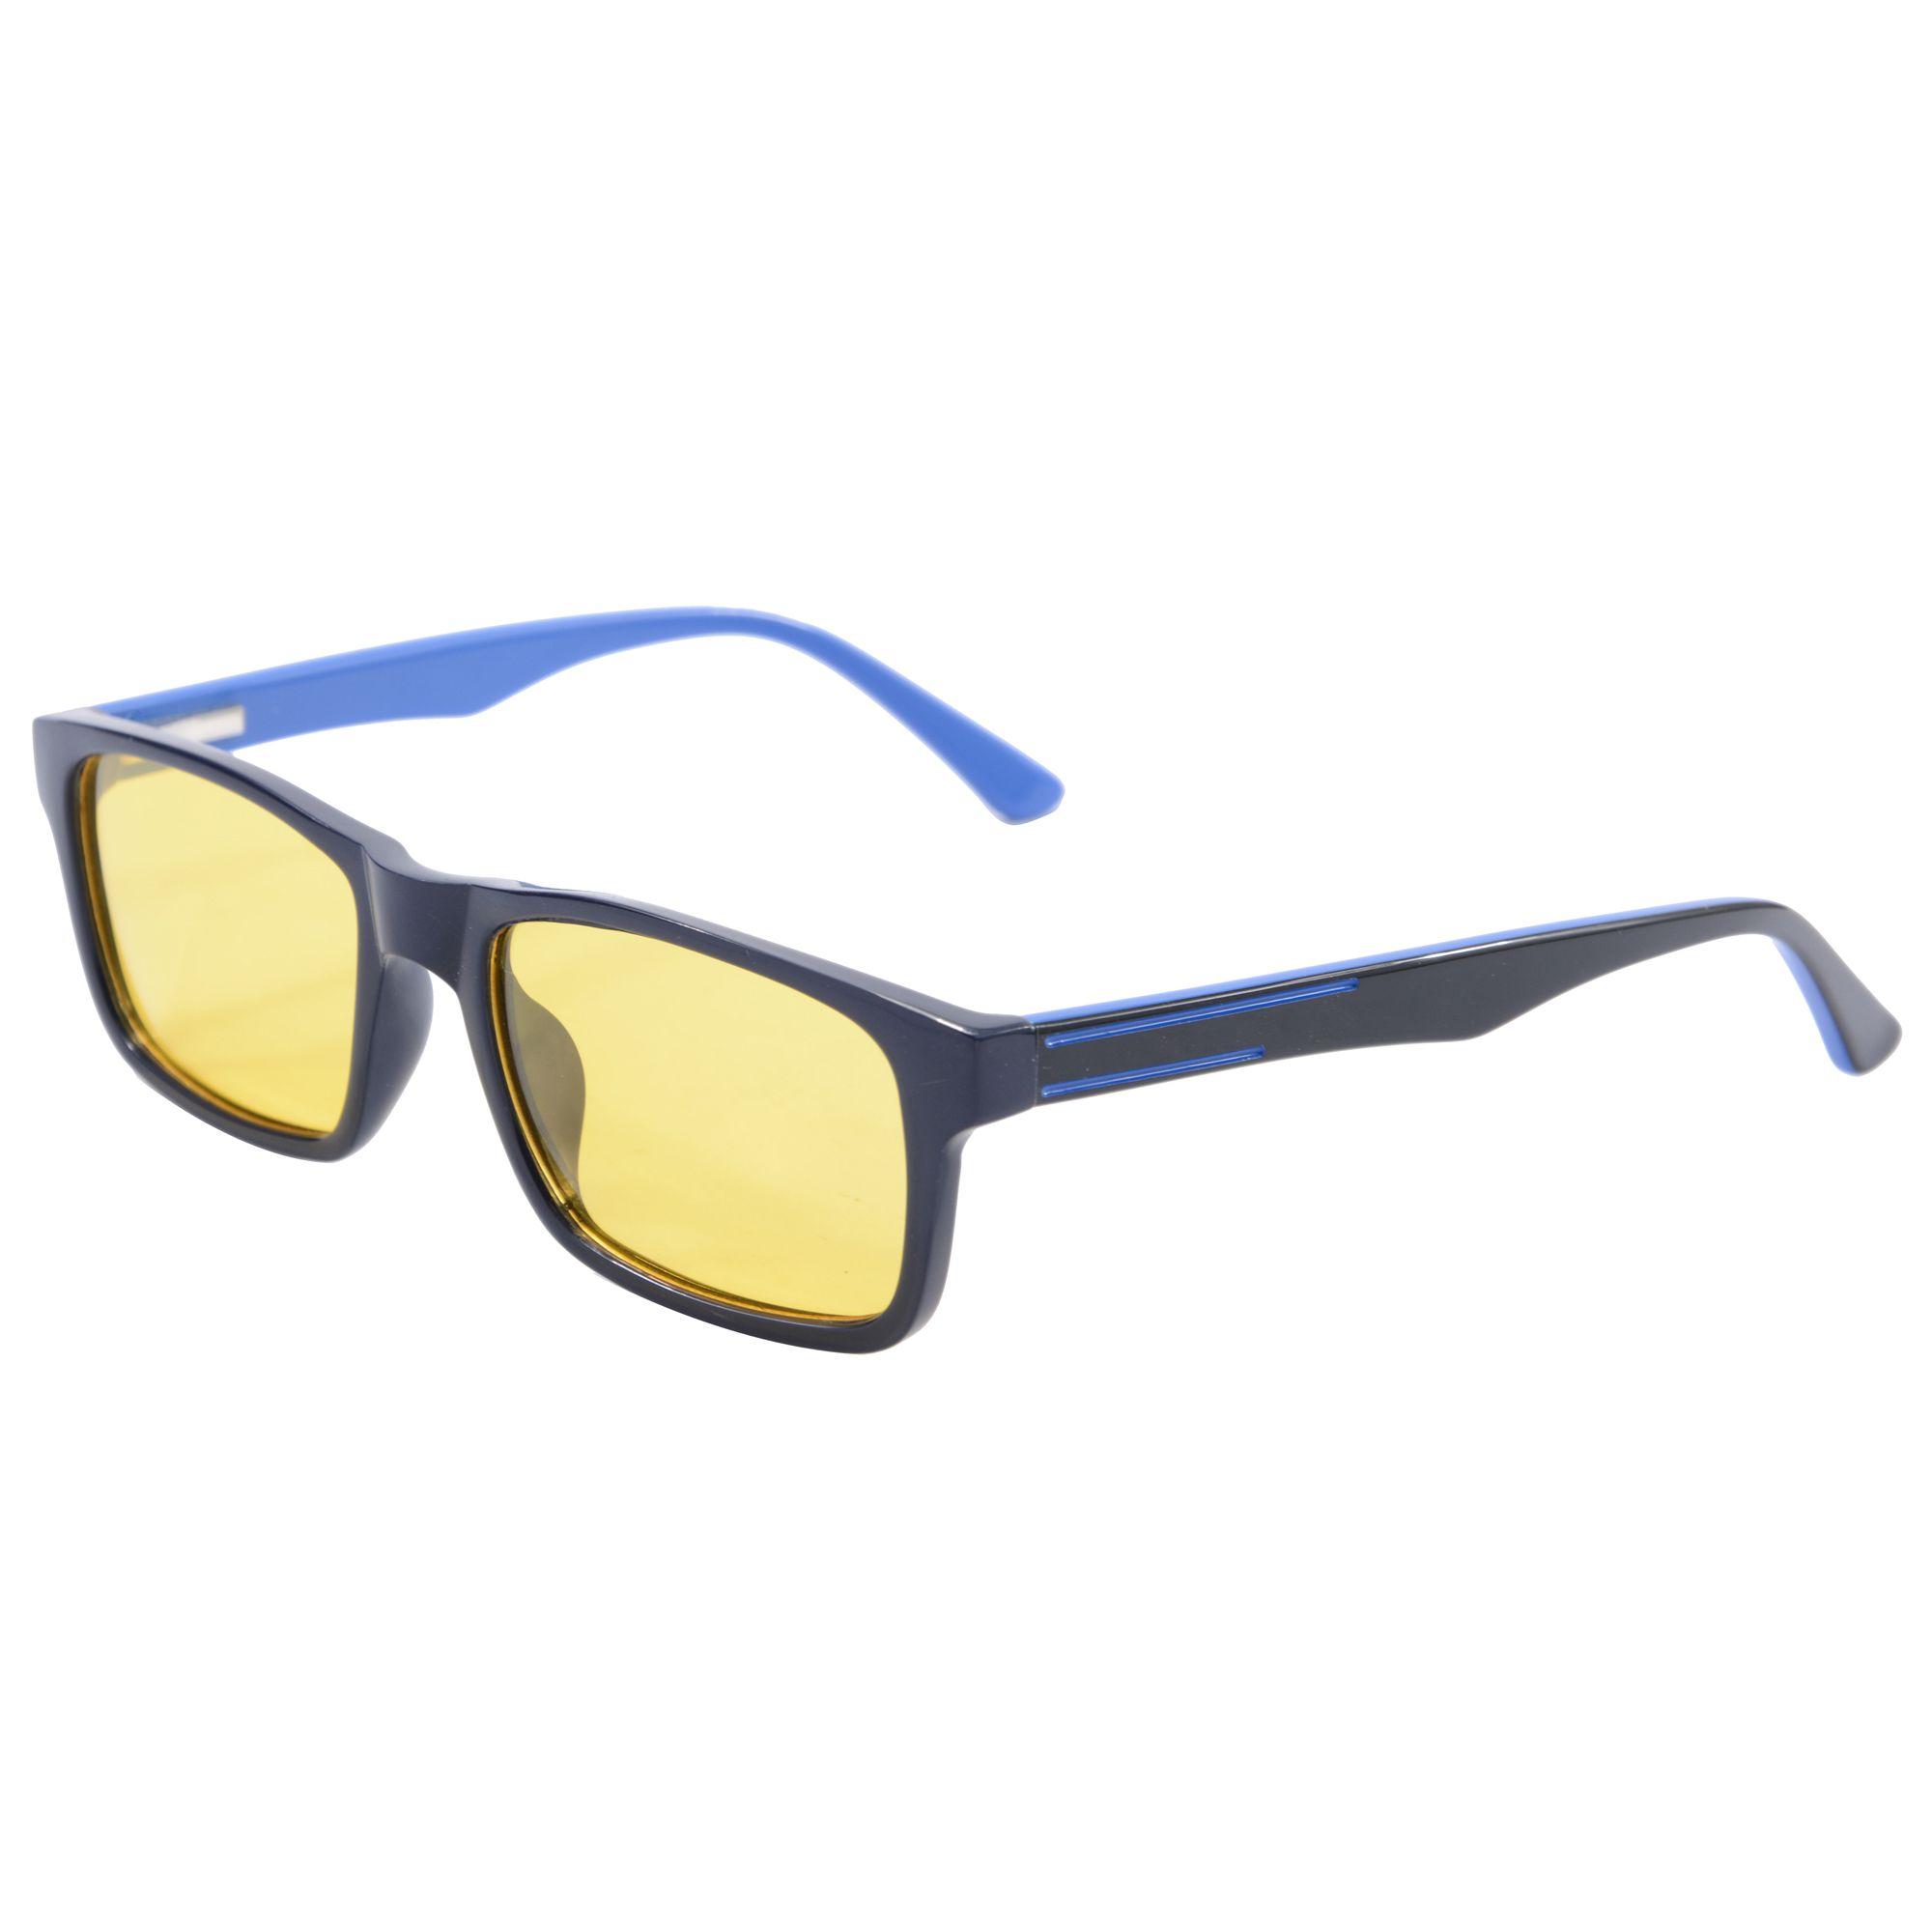 dp regular tpt blue prospek ytl and professional com computer glare care blocking light health personal amazon premium glasses magnification